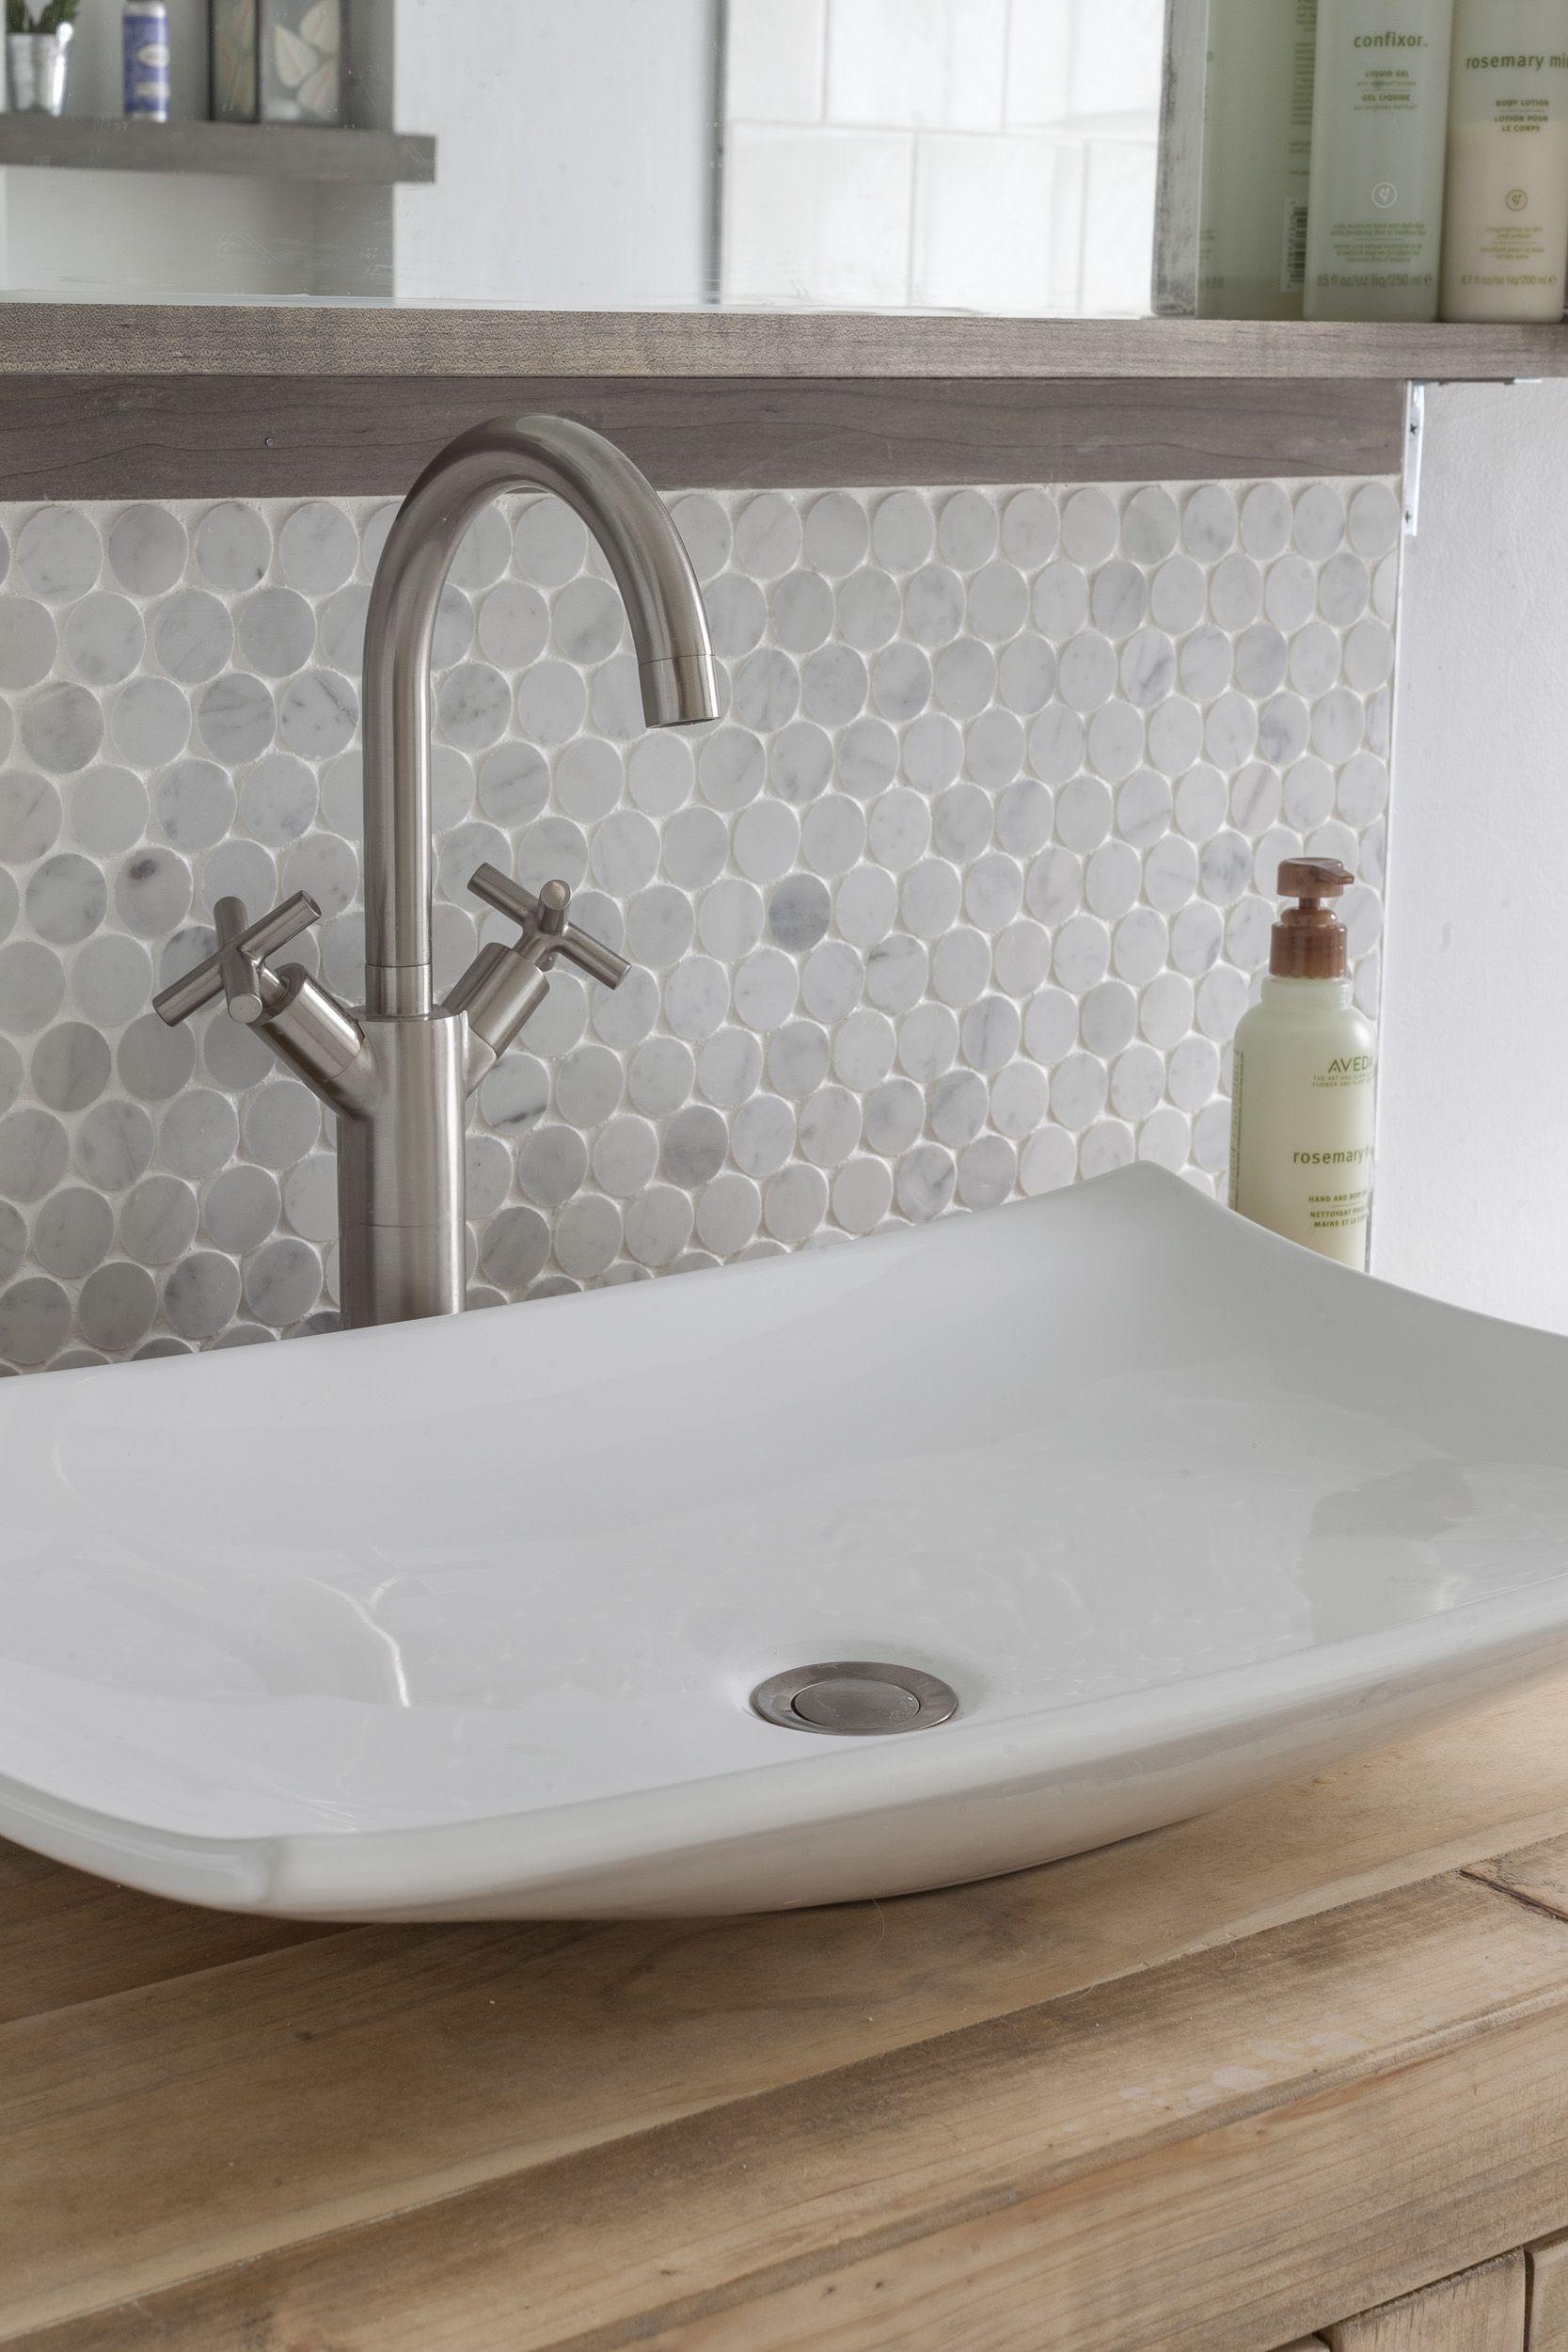 Vessel Sink Marble Penny Tile Backsplash Bathroom